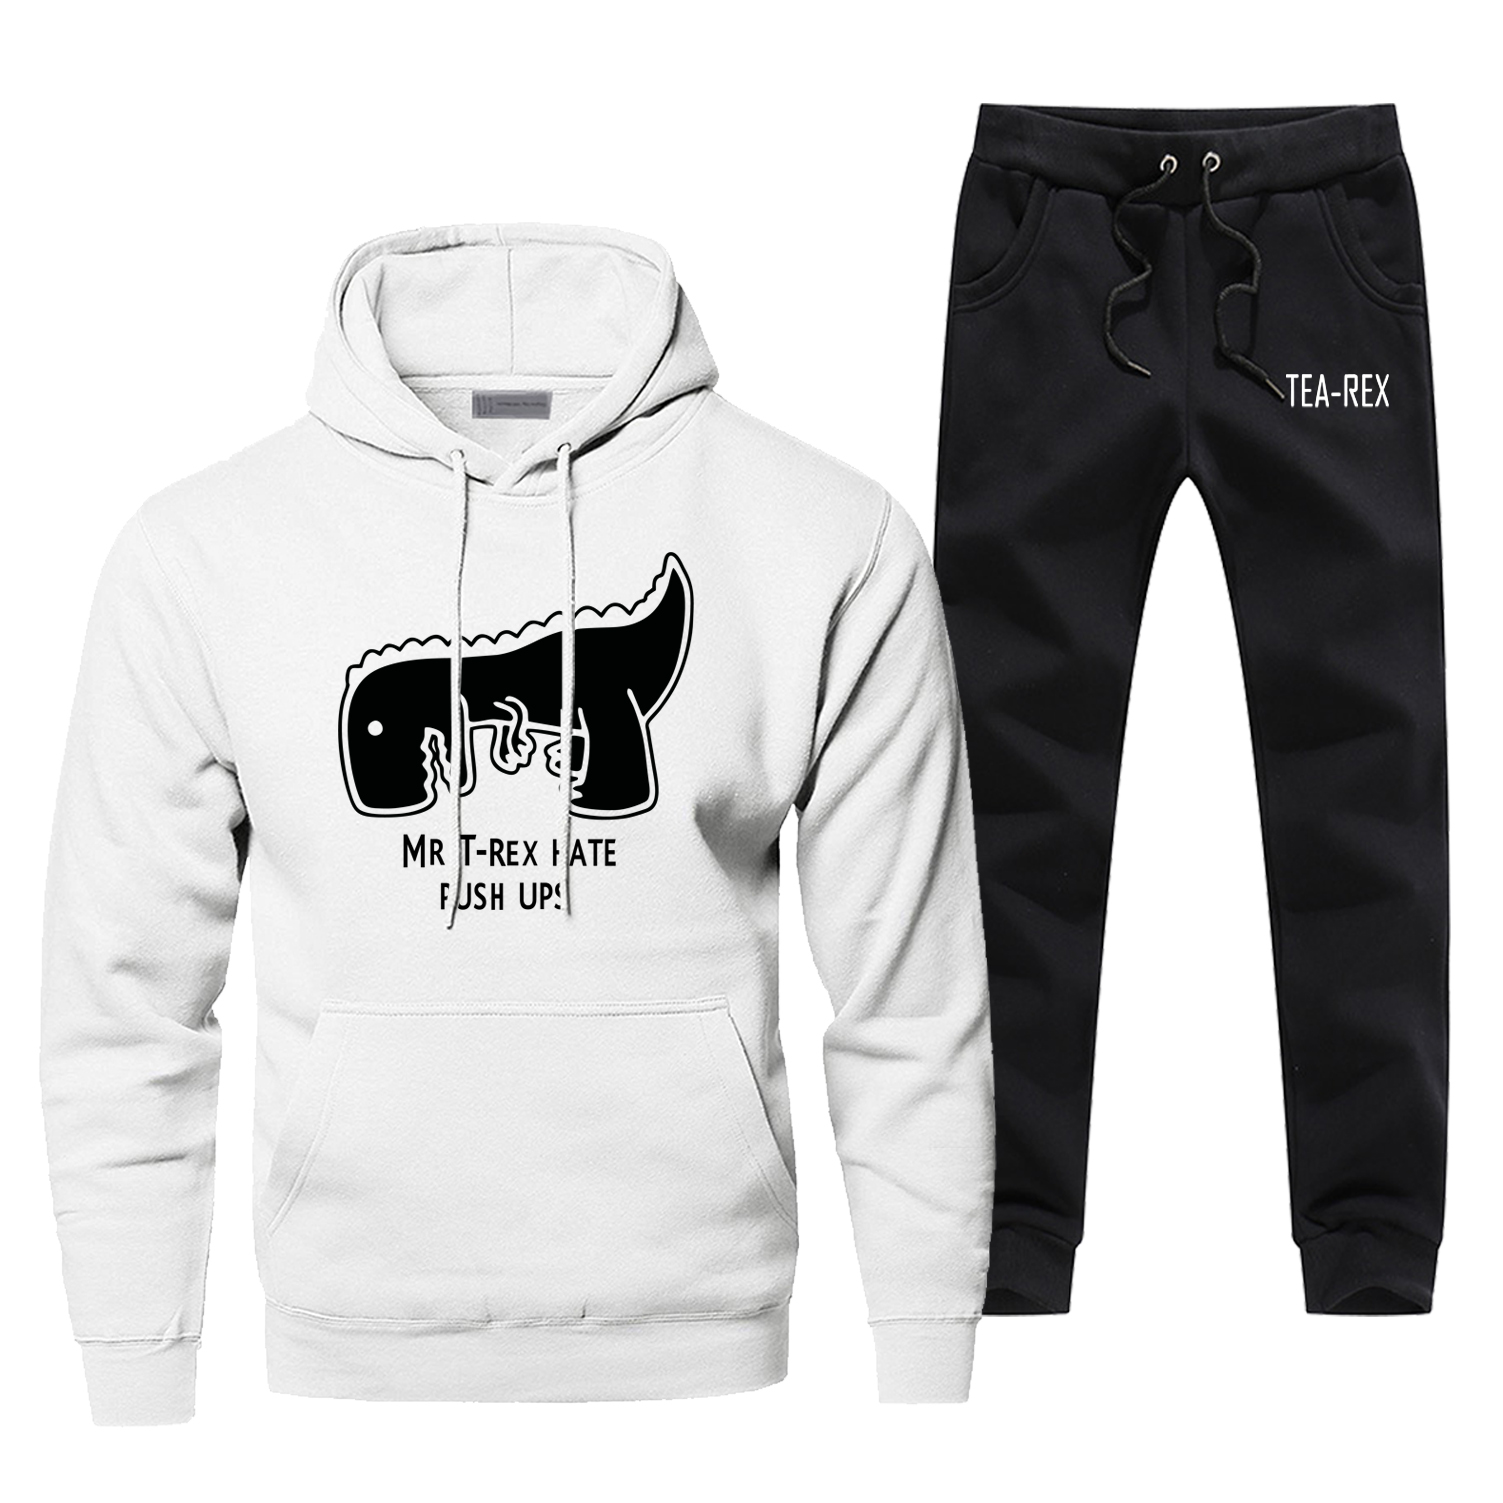 Mr Trex Hate Push Ups Hoodies Pants Set Men Sets Suit Hoody Pant Sweatshirt Sweatpants Pullover 2 PCS Streetwear Black Tracksuit